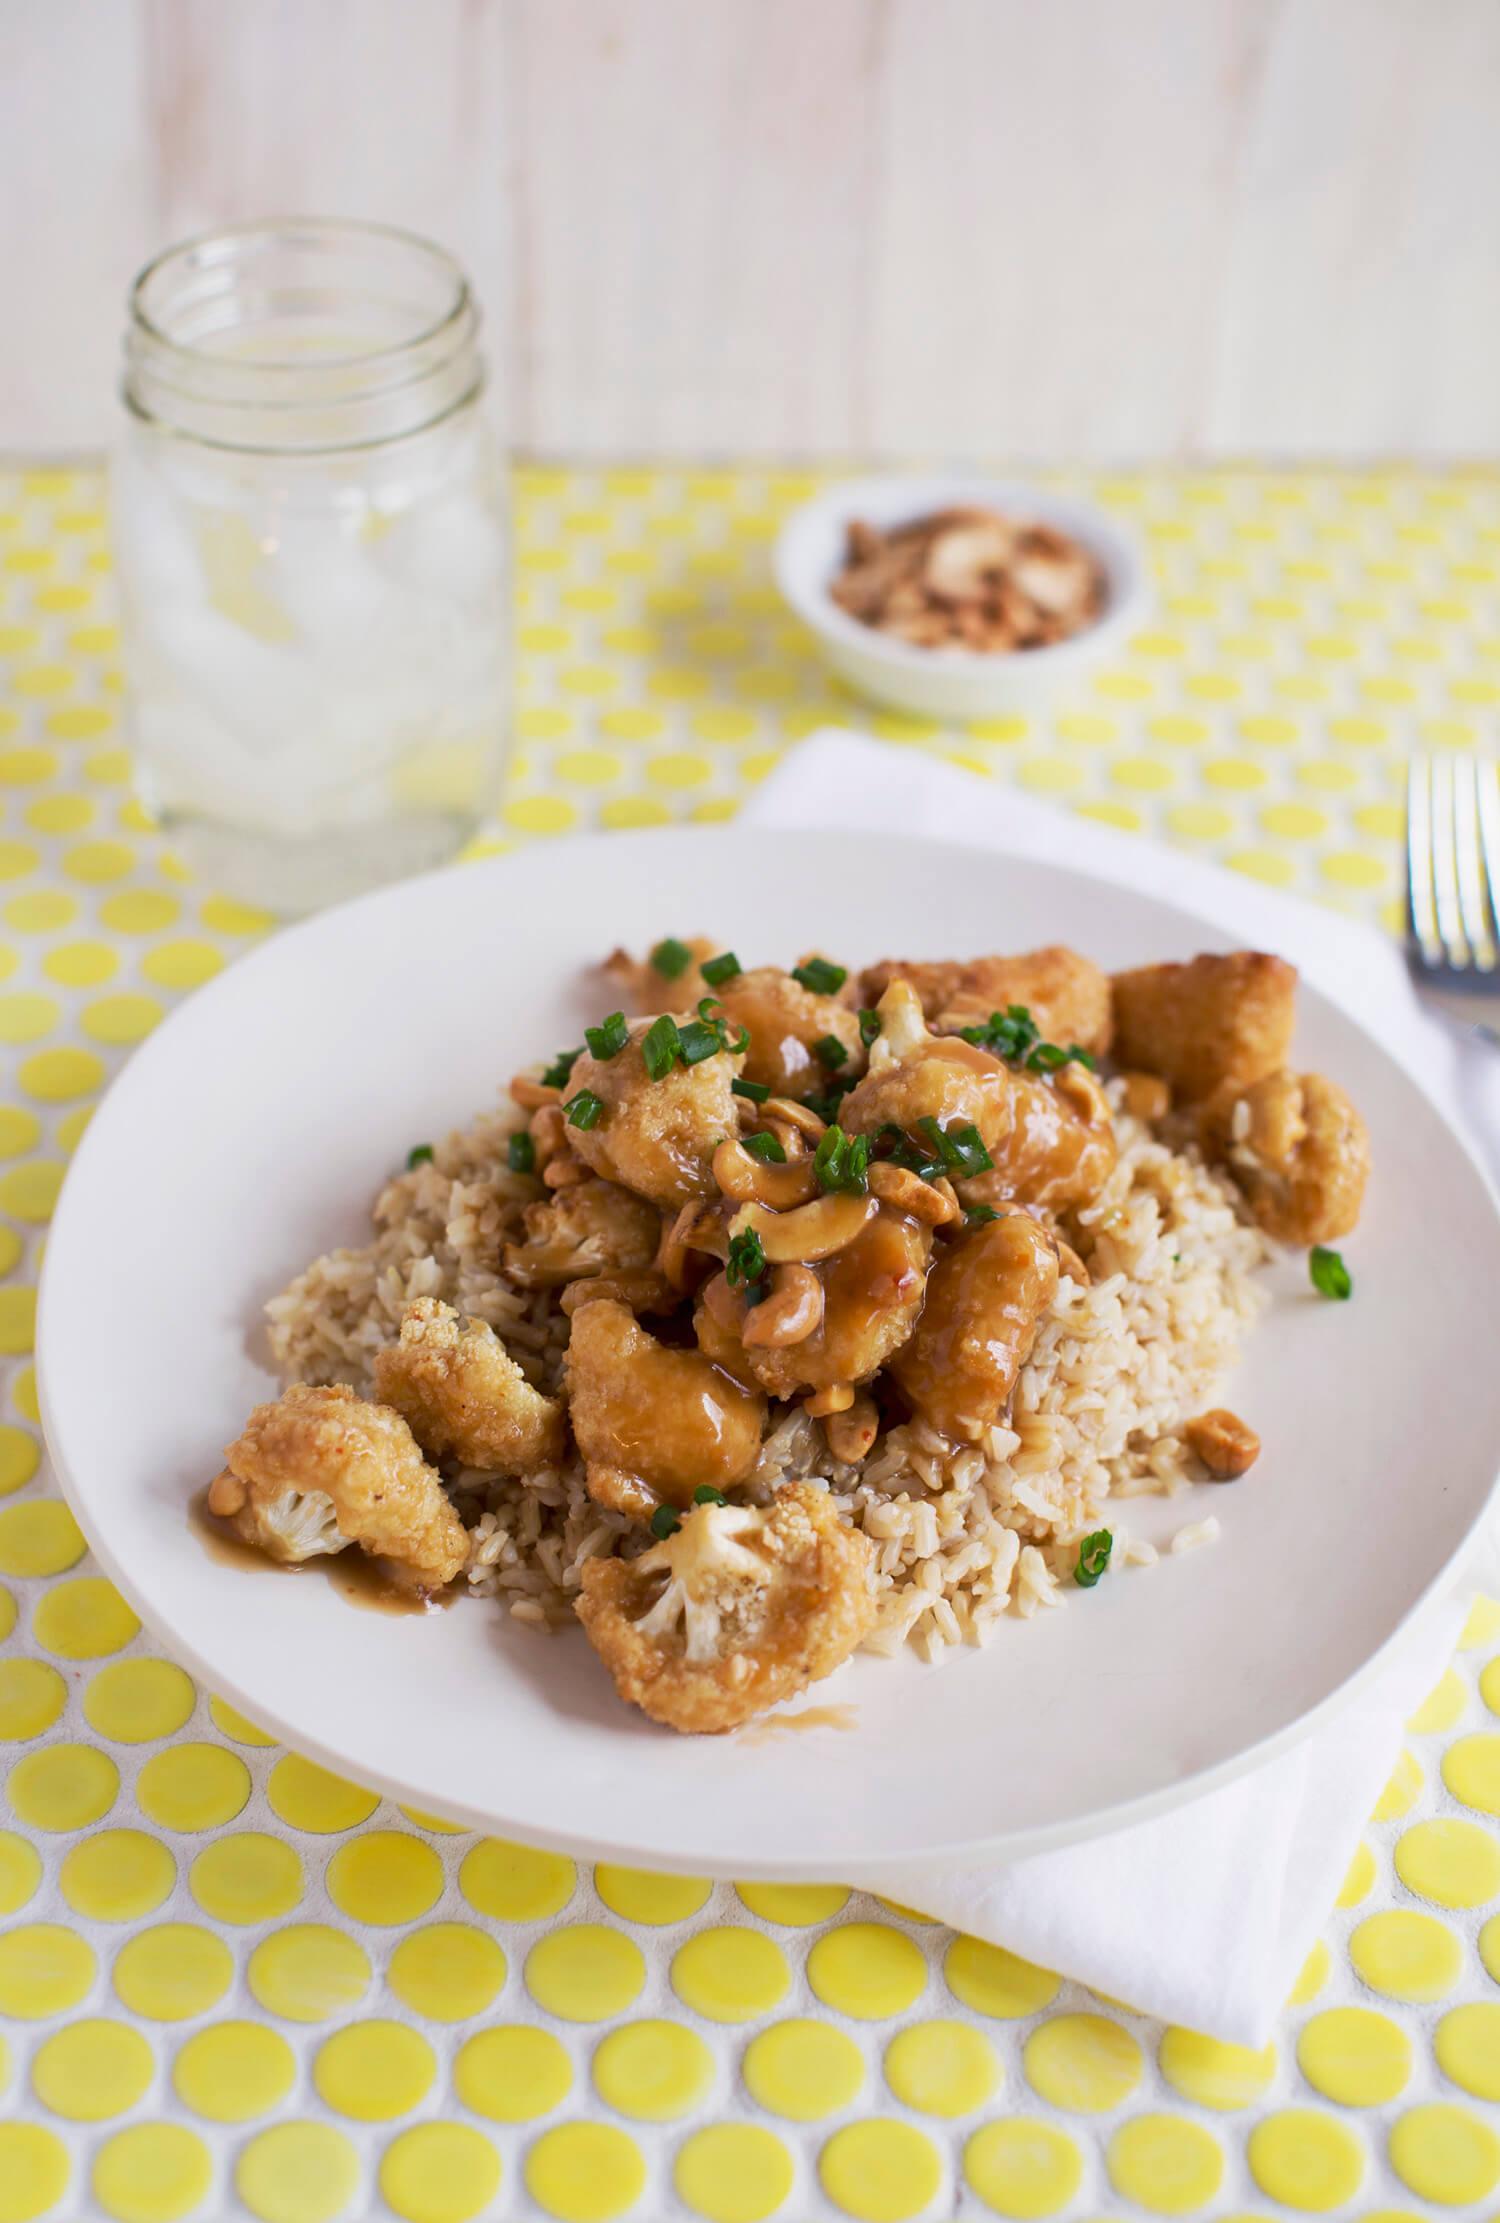 Springfield-style Cashew Cauliflower (via abeautifulmess.com)